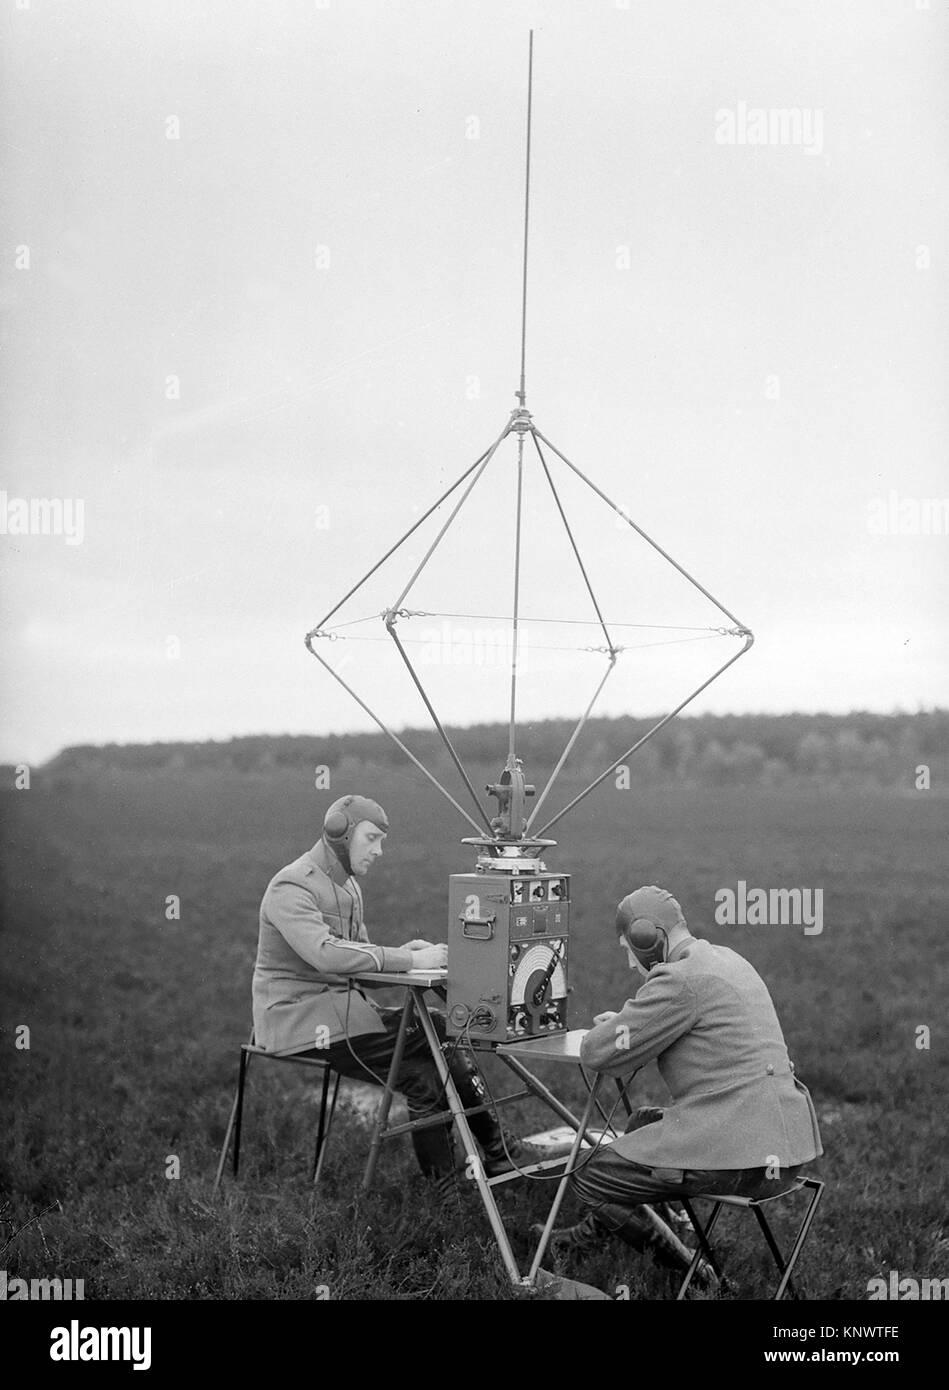 Early aviation history circa 1915 Netherlands two radio operators - Stock Image